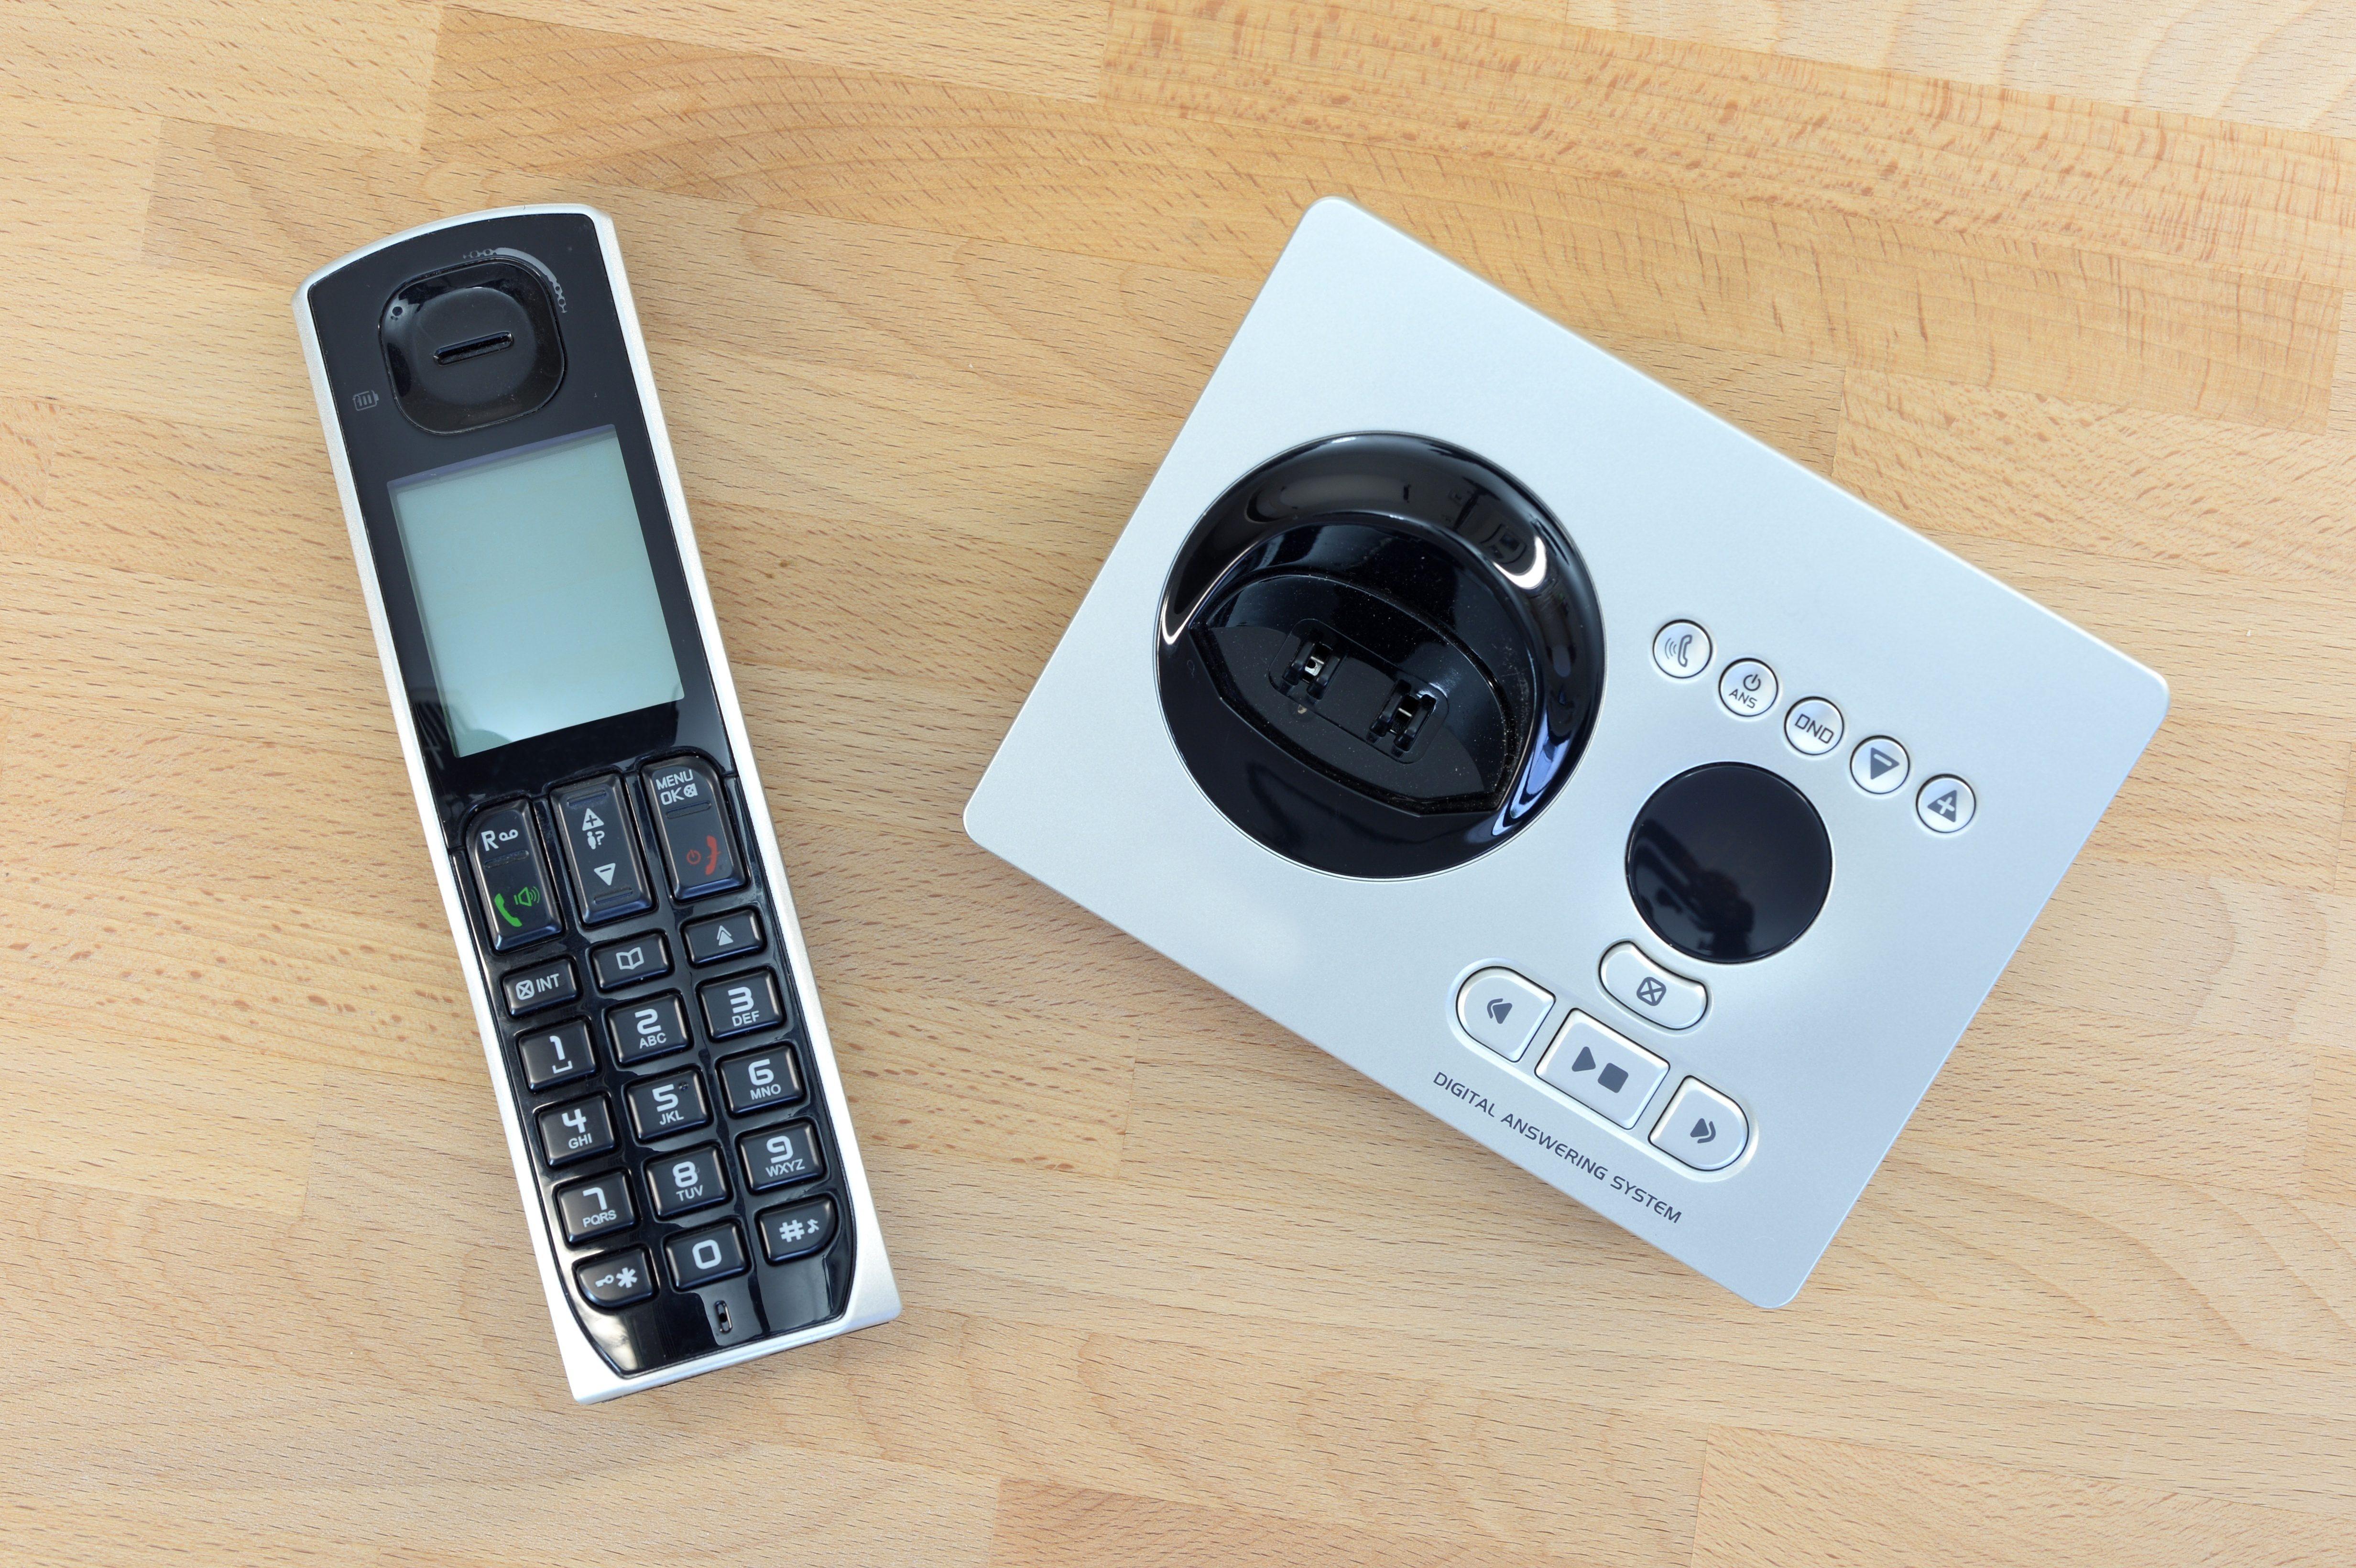 A close up shot of a digital telephone